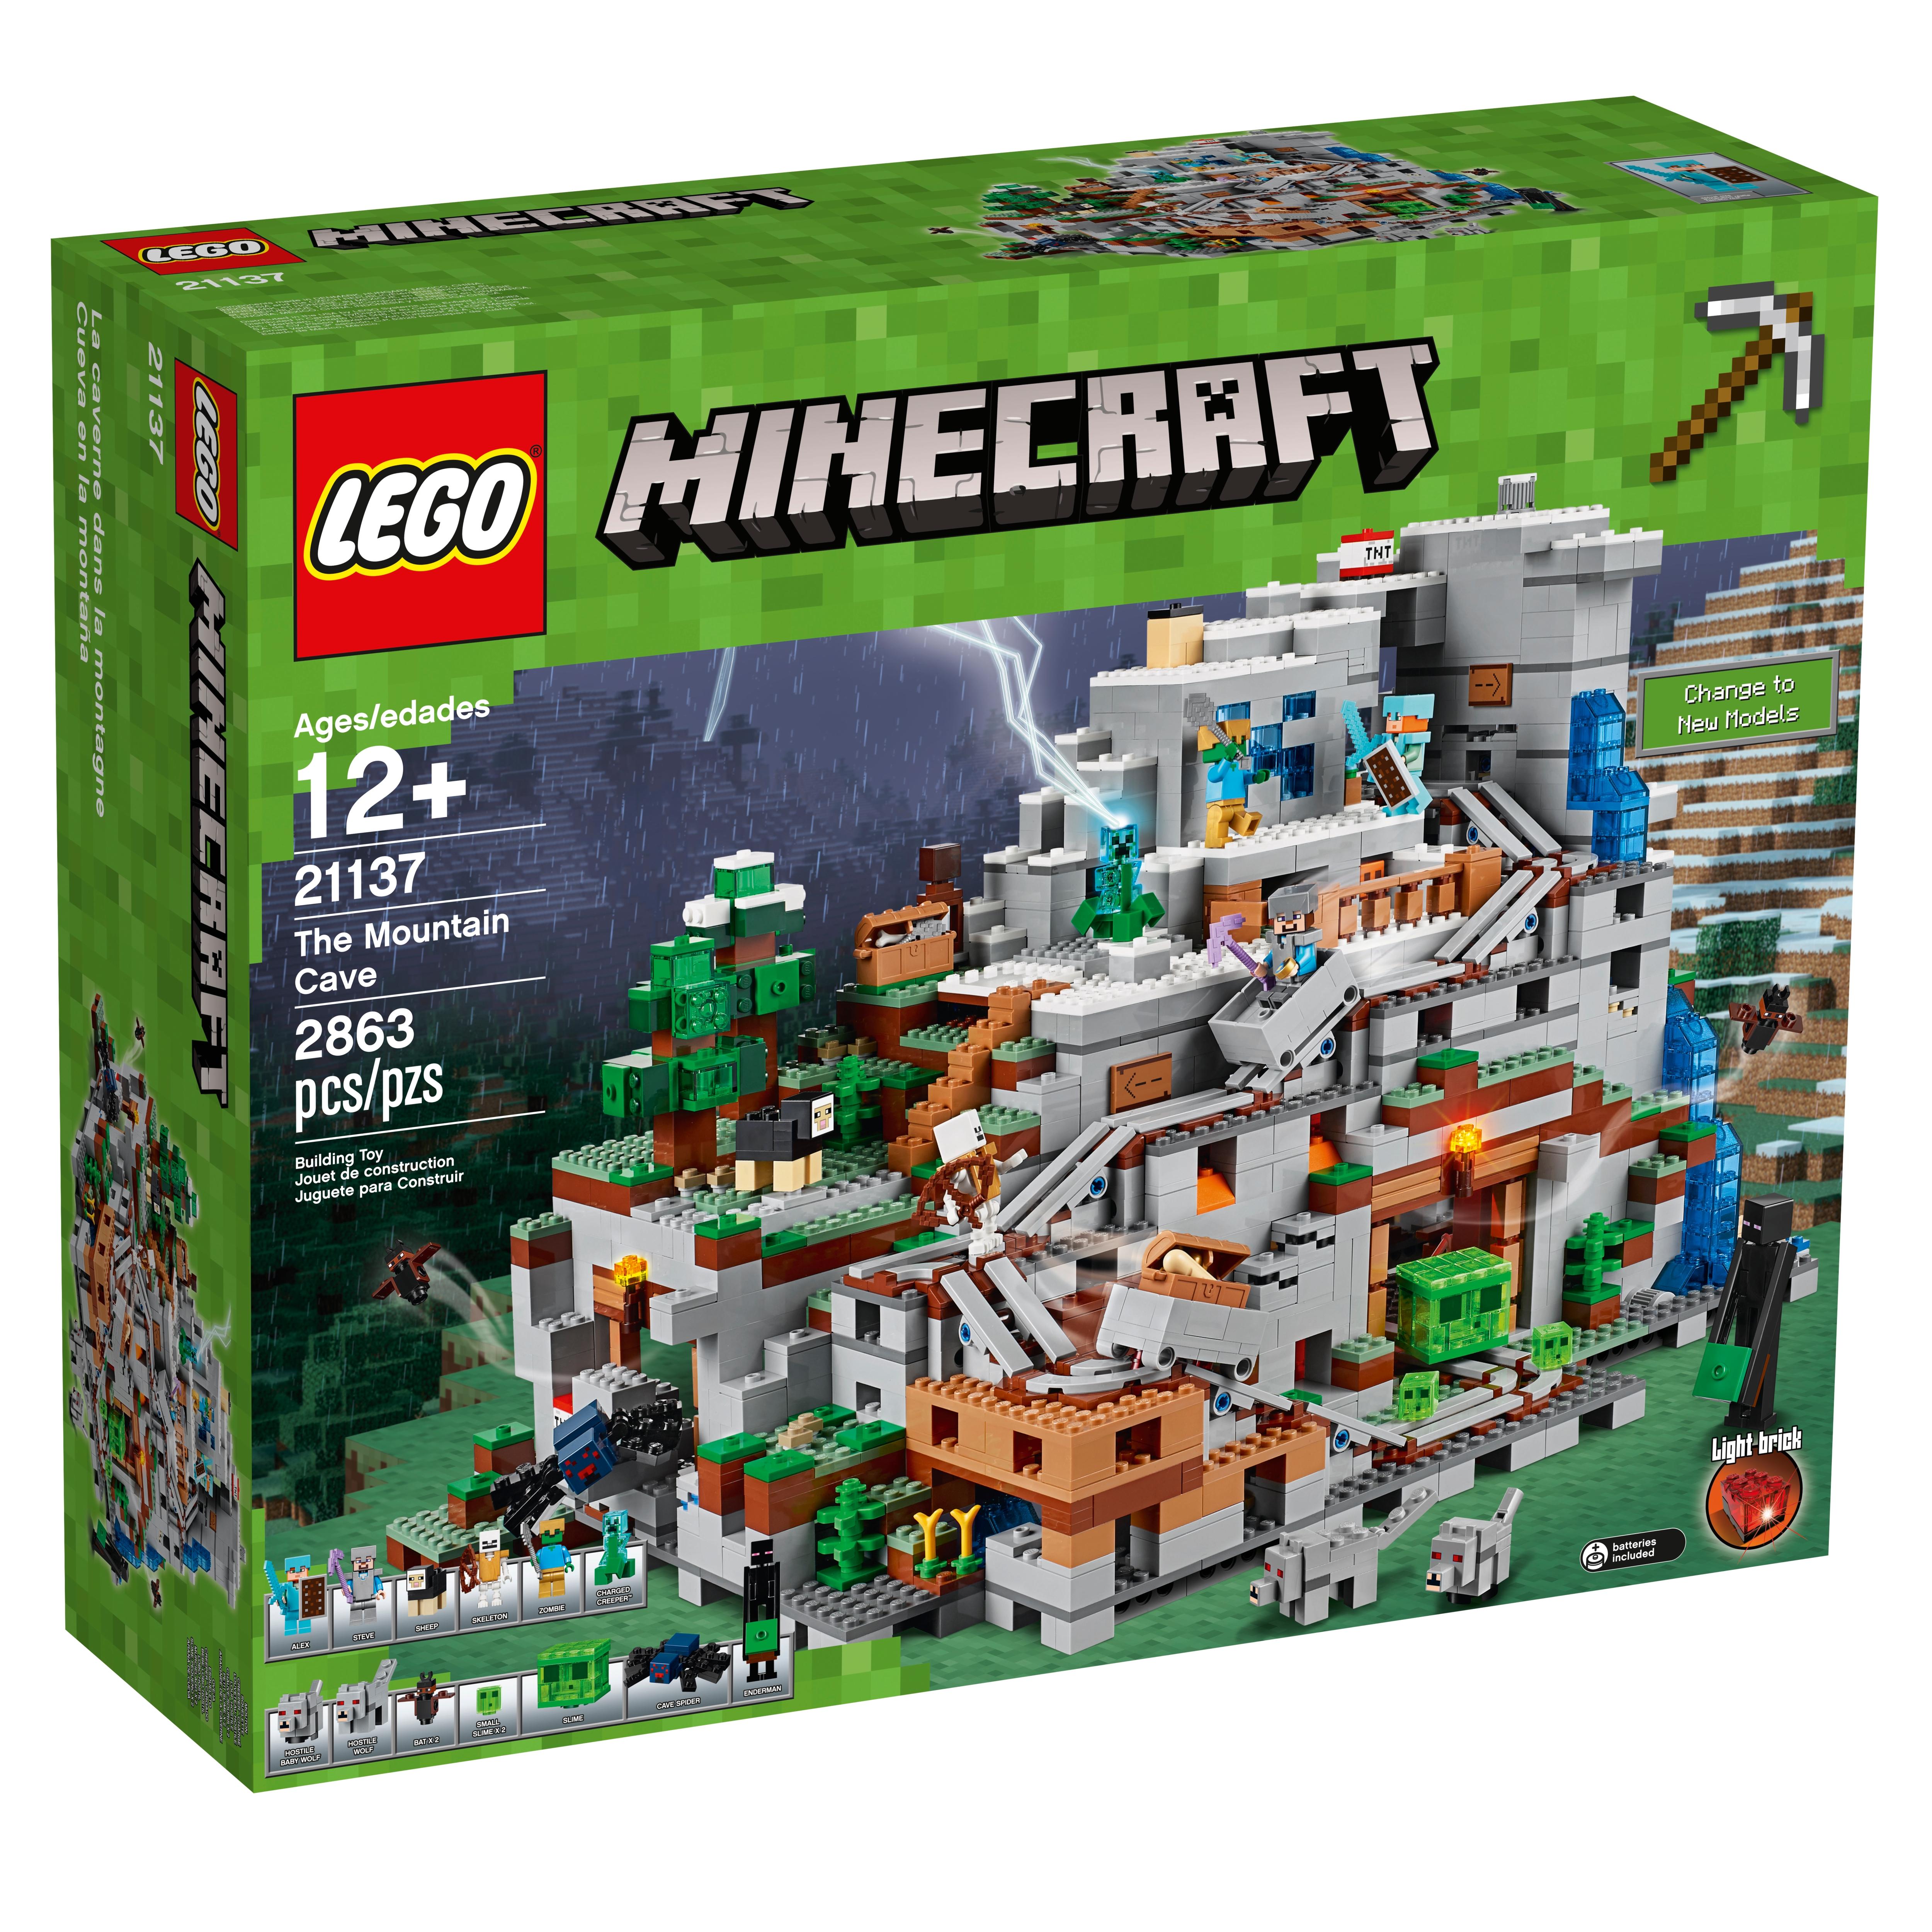 Spider Weapons Creeper Lego Minecraft Minifigure Lot F ~ Steve Zombie x 2